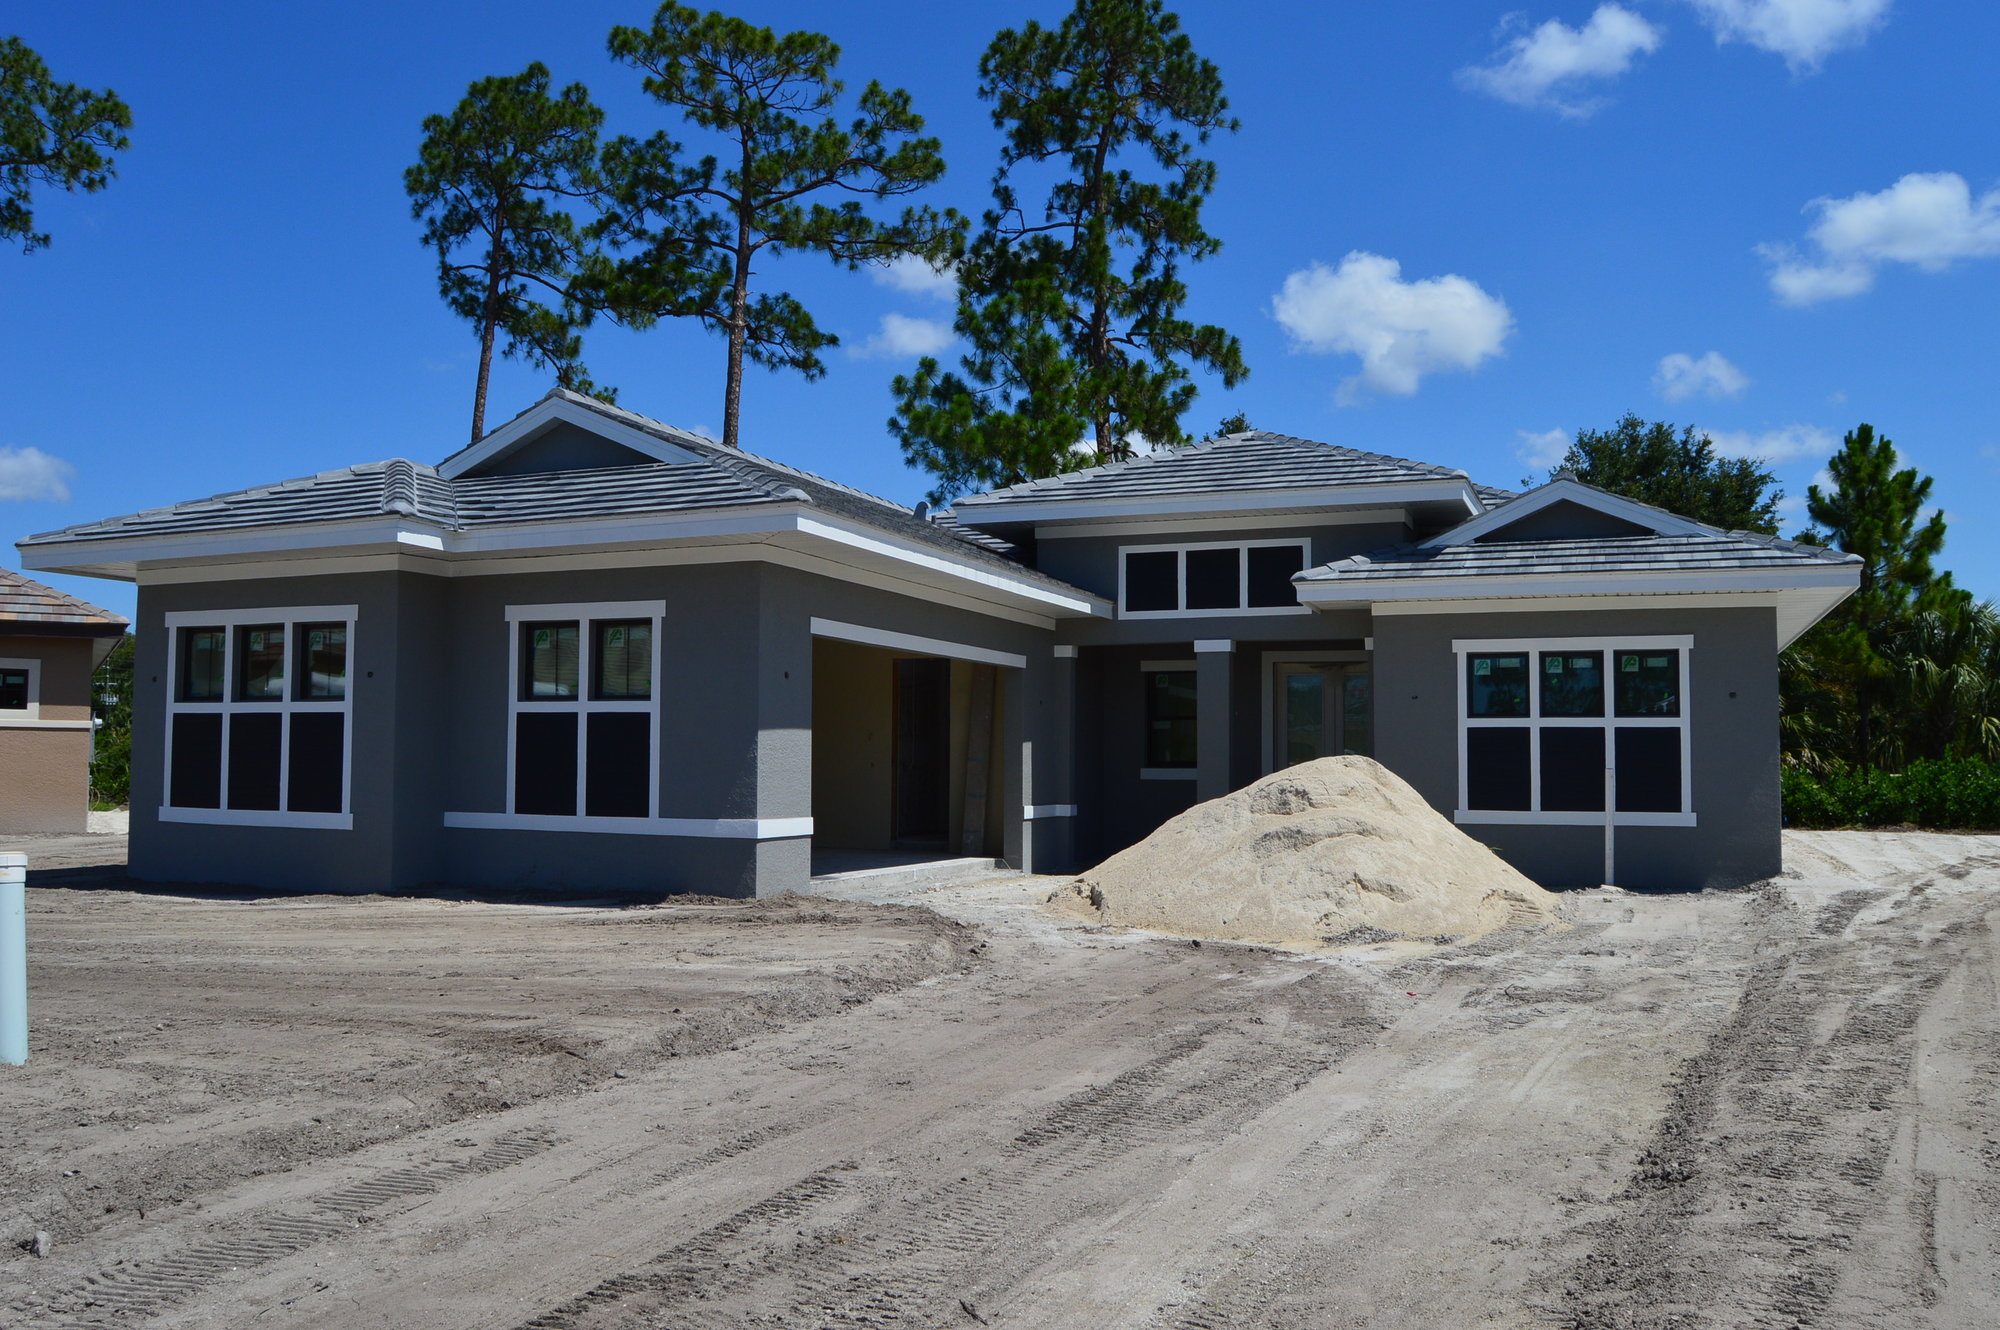 New home builder southwest florida new construction southwest florida florida new homes